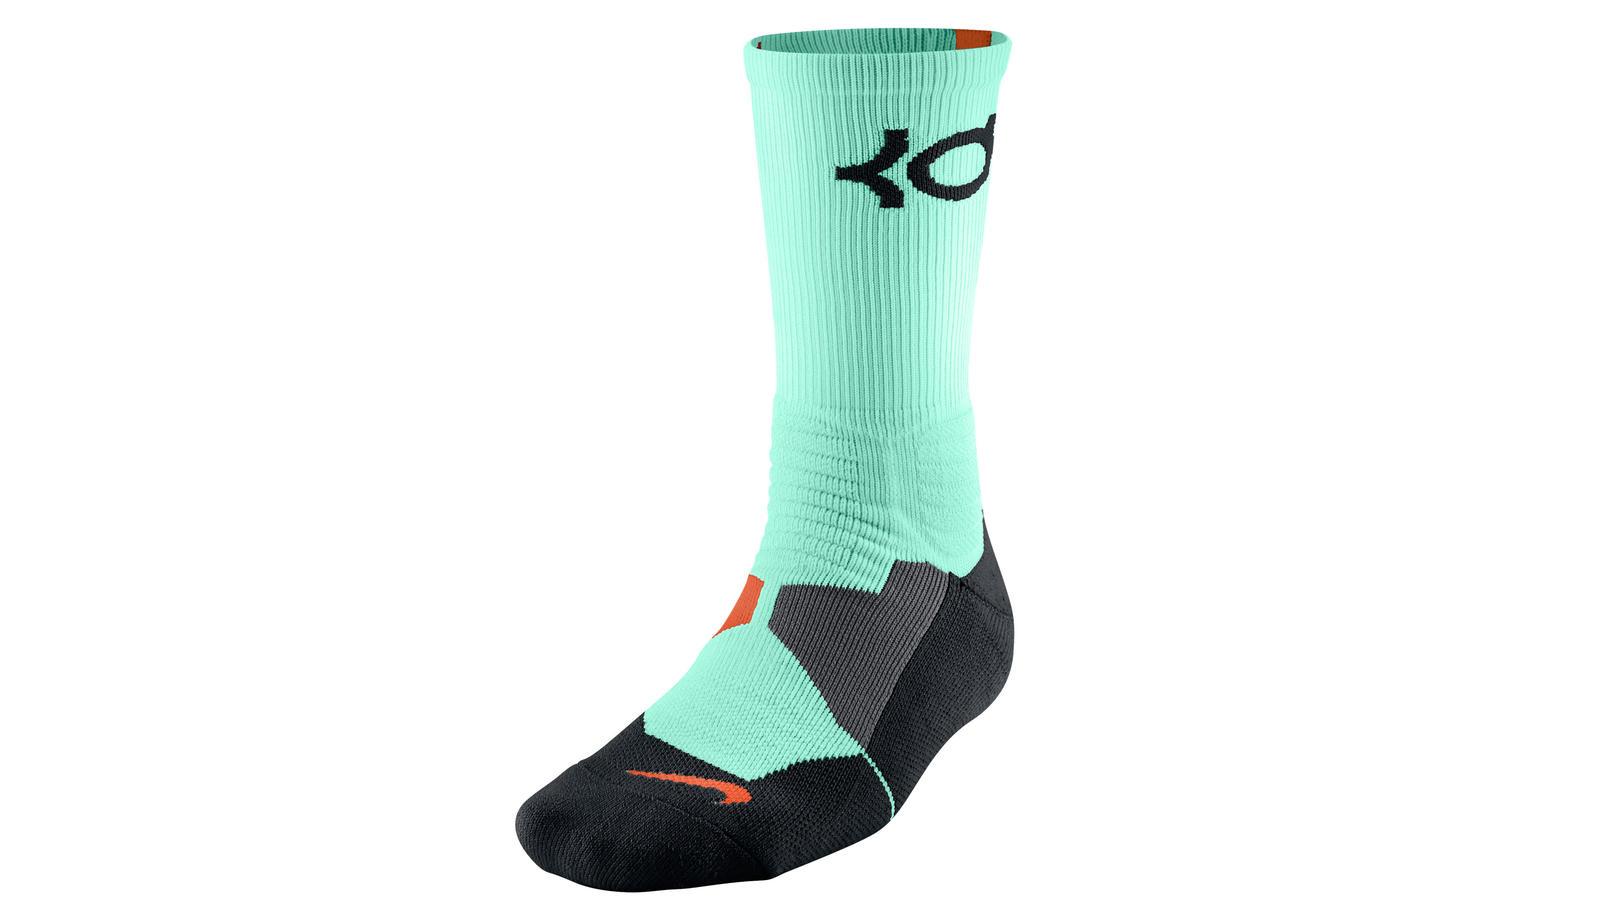 kd-sock-front